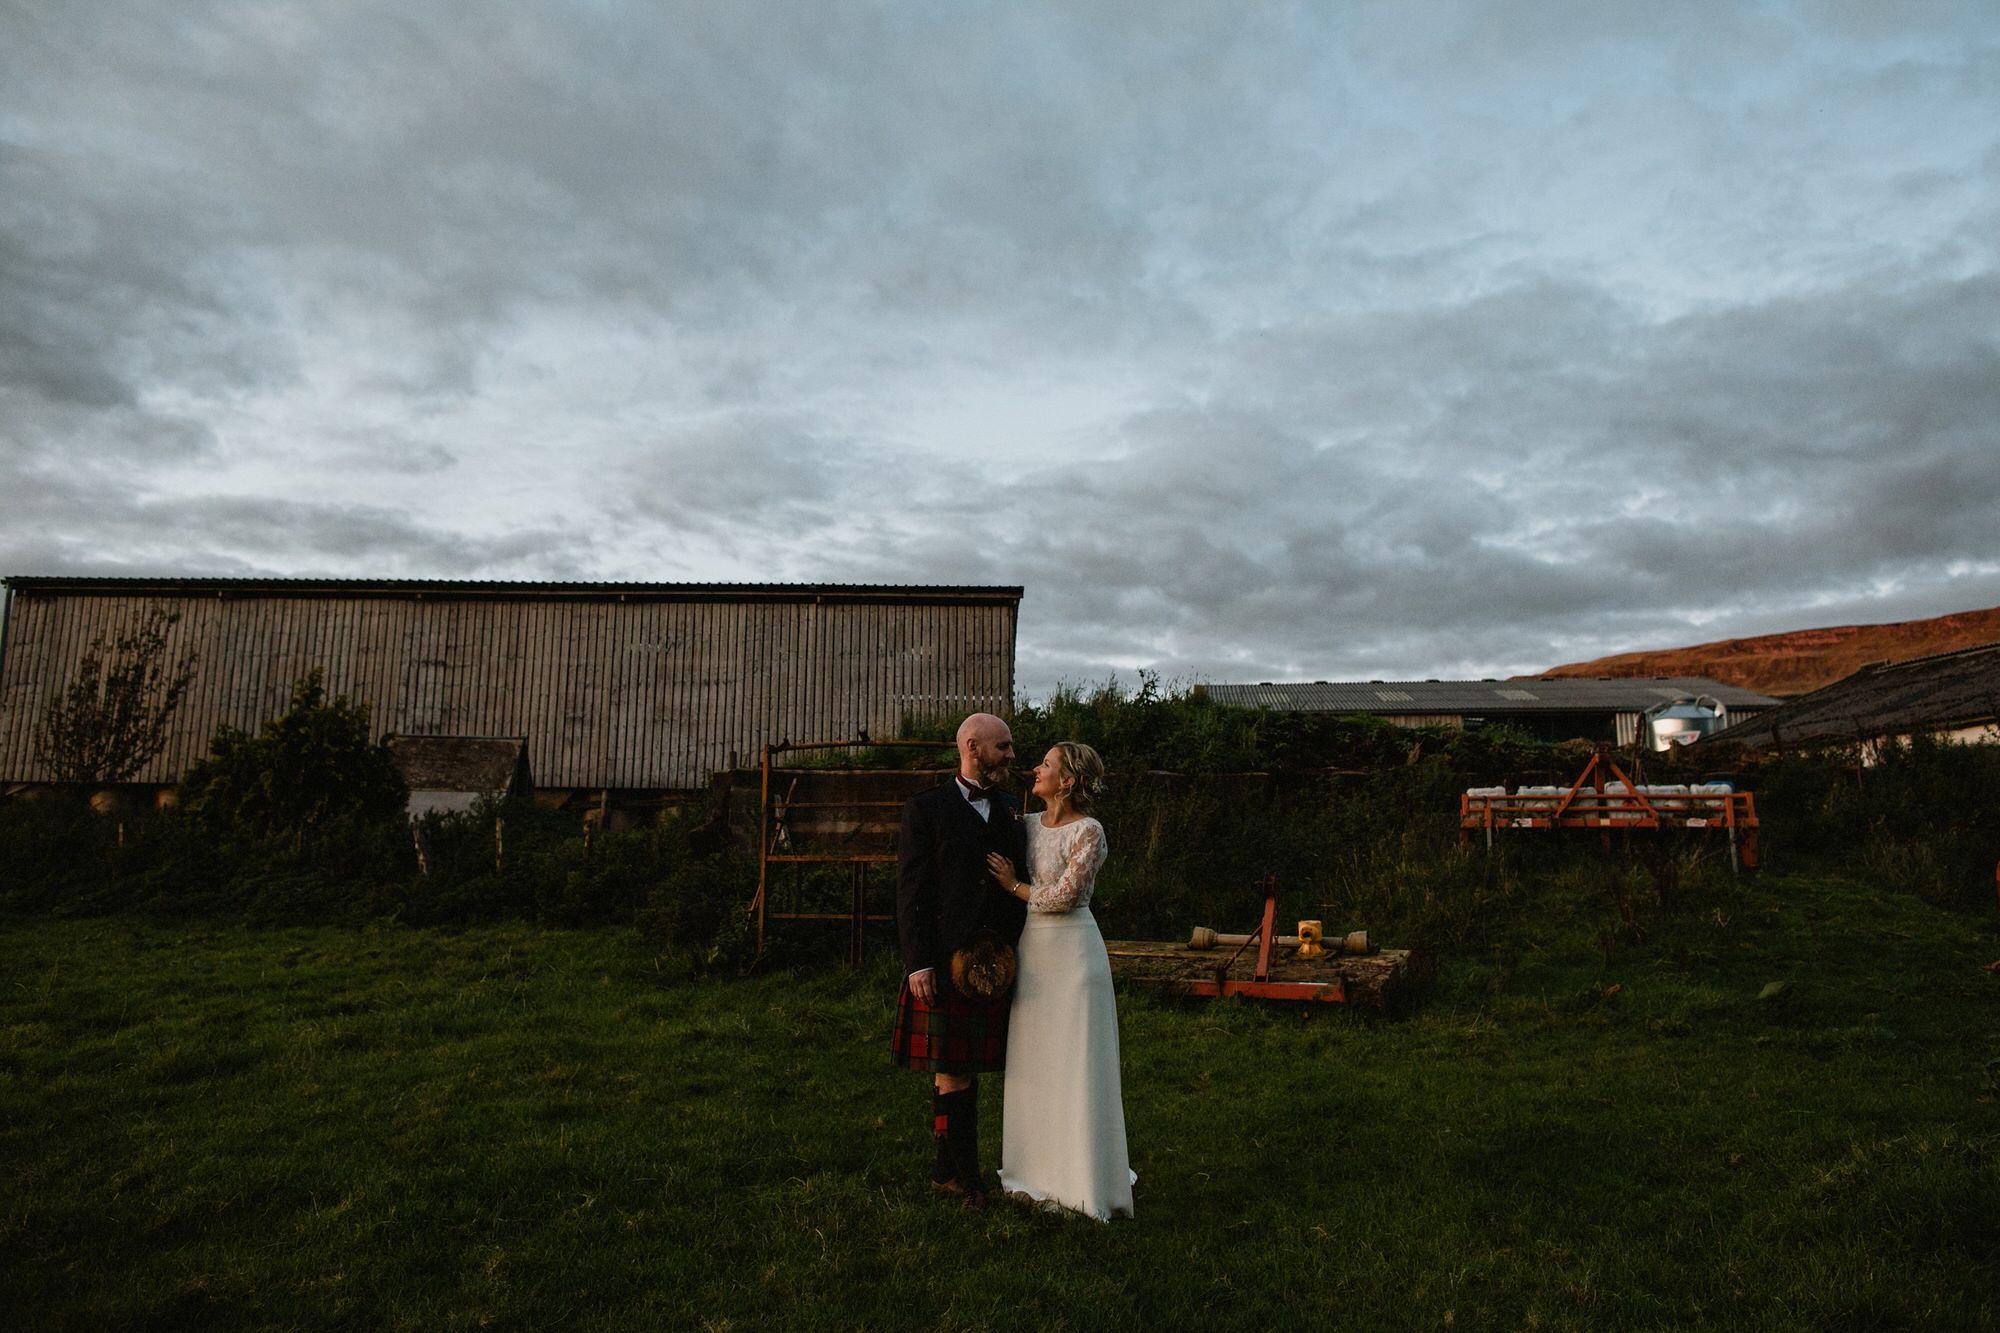 067 TIN SHED KNOCKRAICH WEDDING AUTUMN ZOE ALEXANDRA PHOTOGRAPHY